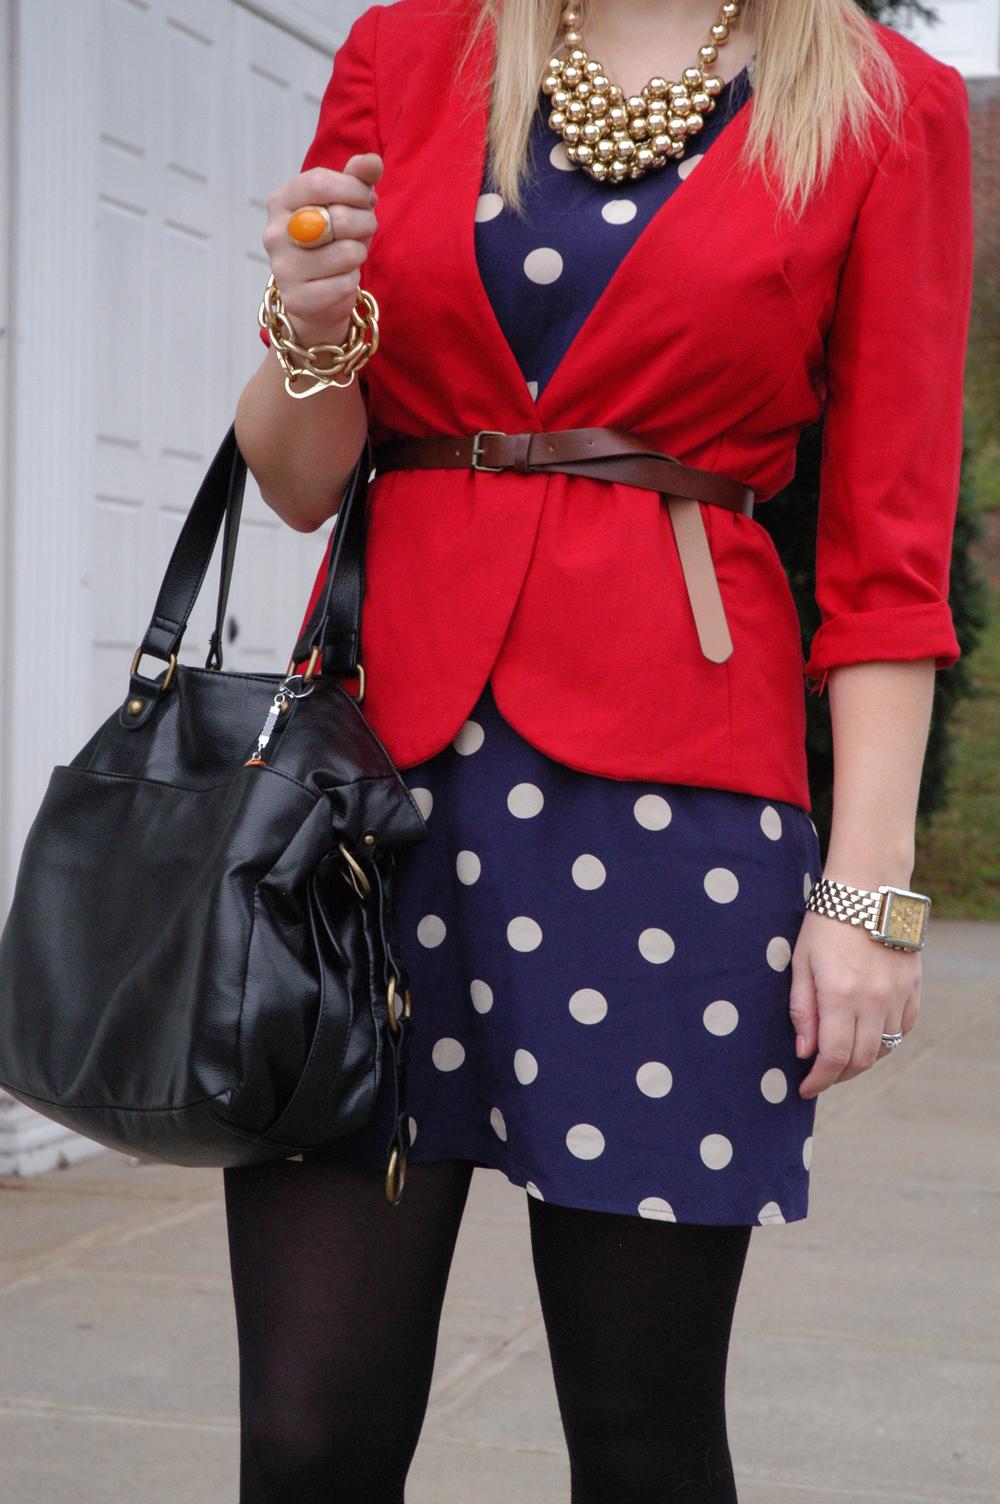 Dress:  Madewell  | Blazer: Handmade ( Cynthia Rowley Simplicity Pattern #2250 ) | Tights: Merona, Target | Shoes: Dolce Vita via TjMaxx | Purse: Target | Jewelry: Joann Fabrics, H&M, Belk | Belt: H&M | Shades: H&M